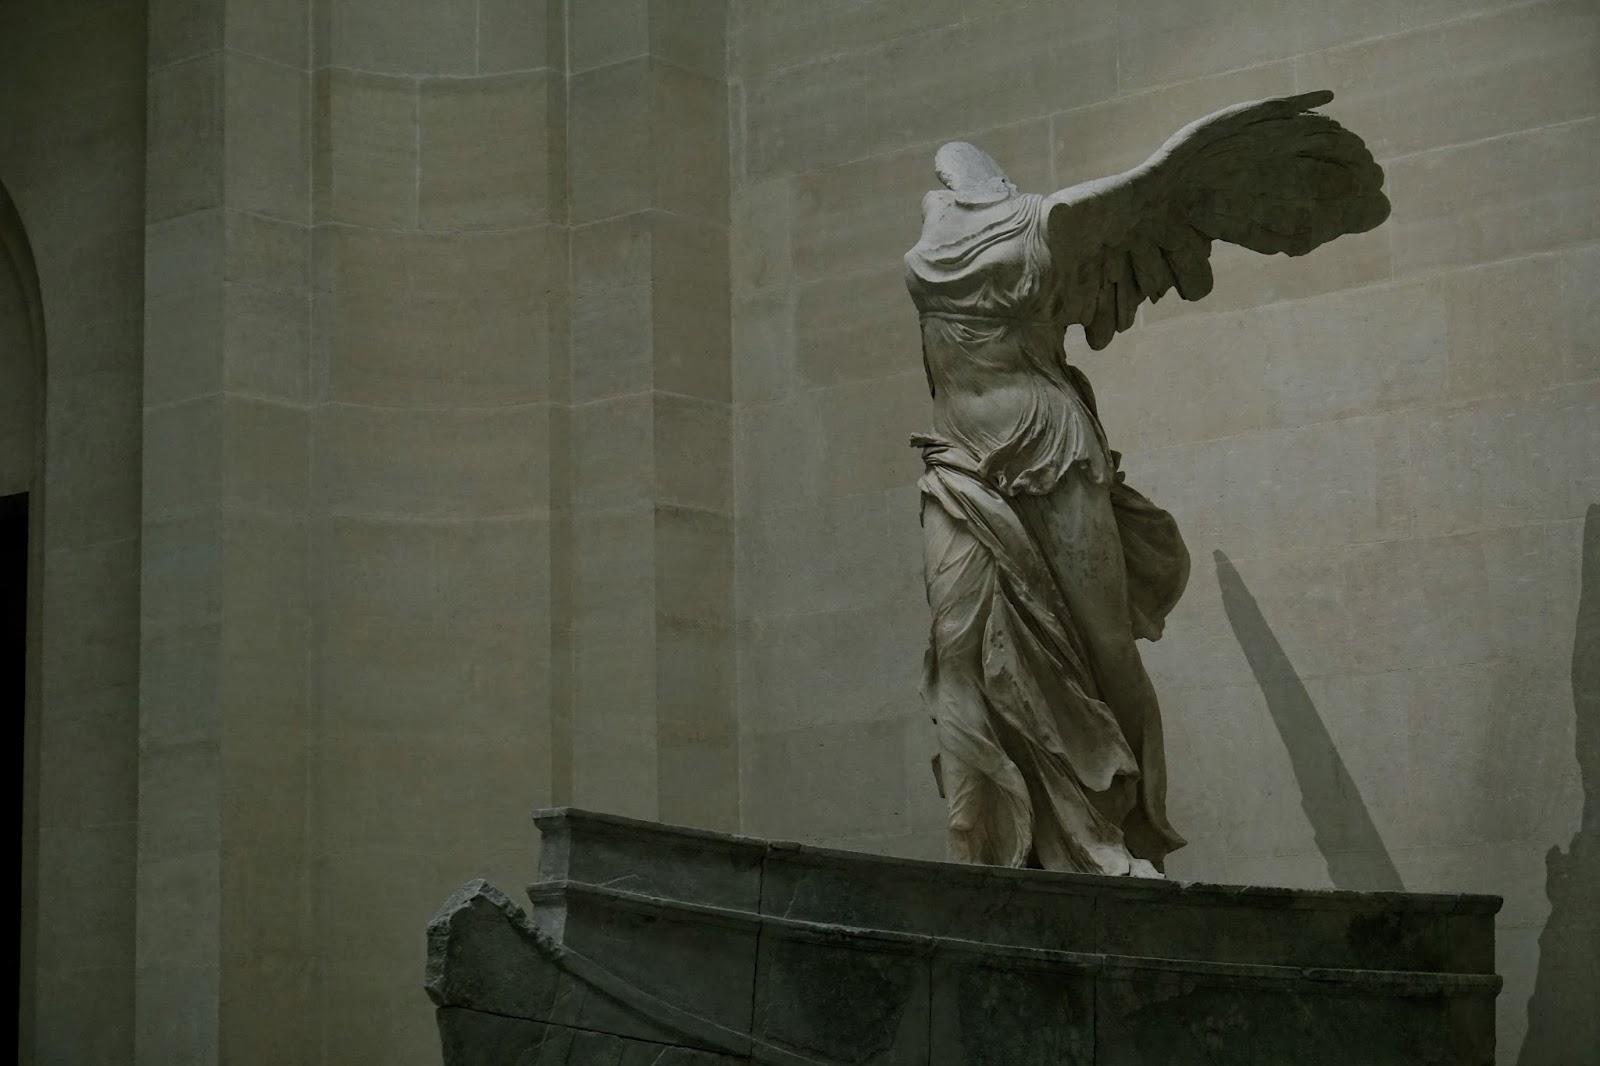 ルーヴル美術館(Musée du Louvre)